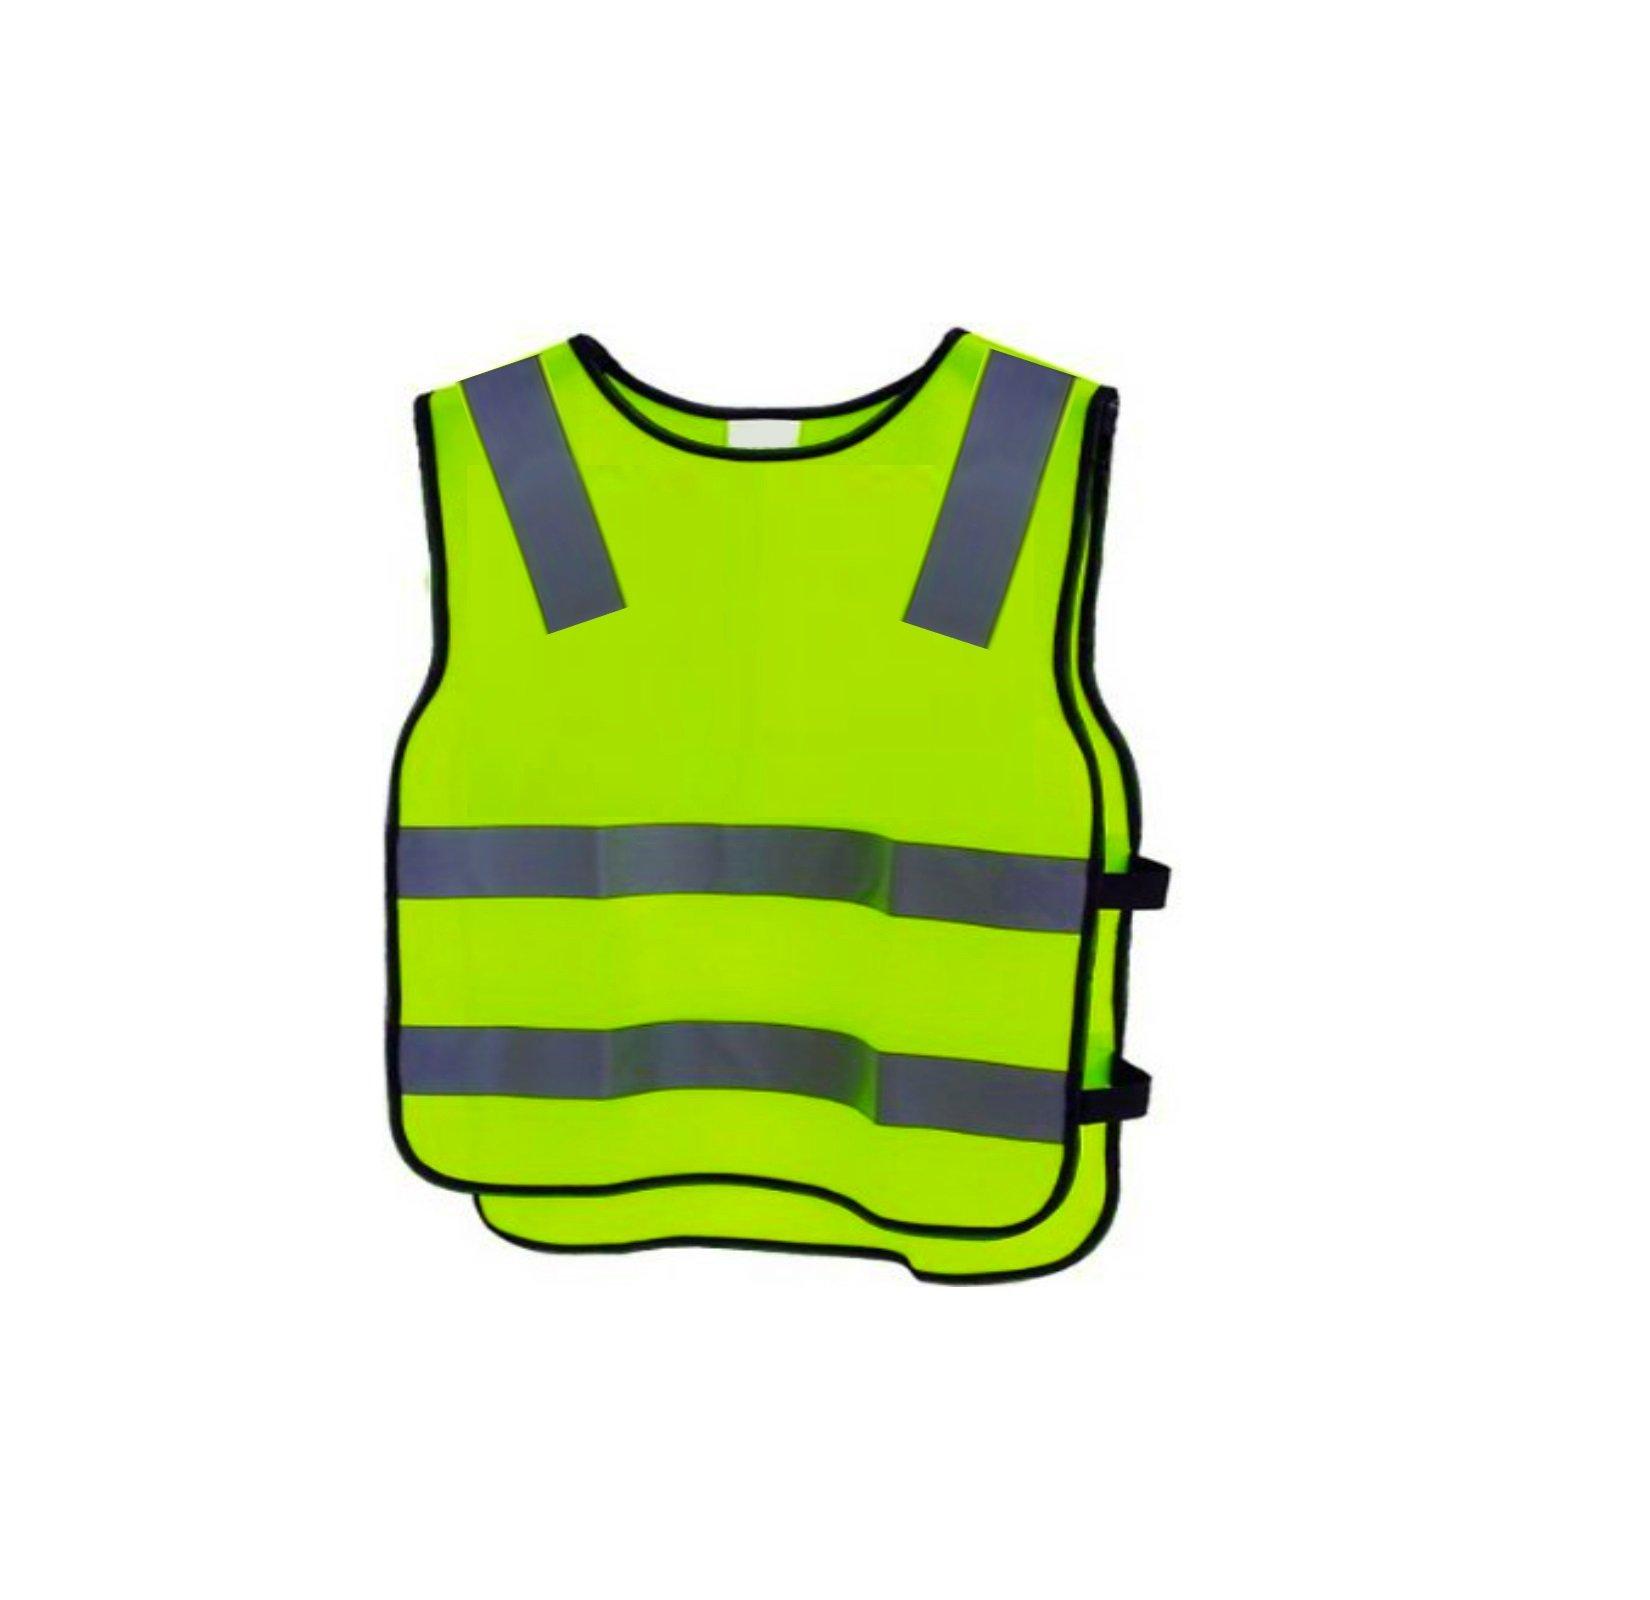 5, 4-6 Years Kids High Visibility Hi Viz Safety Vest Top Hi Vis Baby Toddler Waistcoat Childrens Yellow Reflective vest